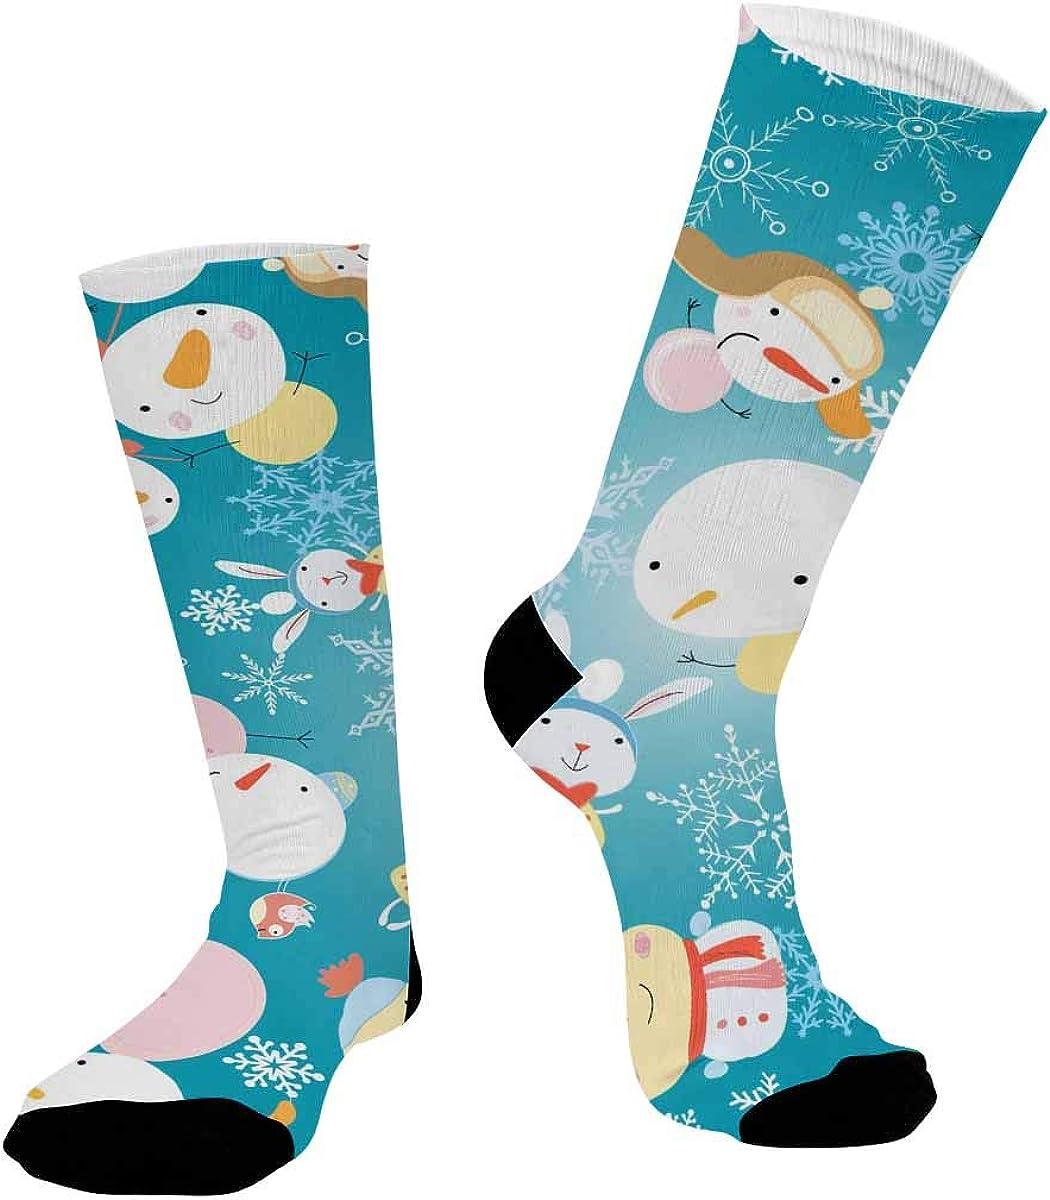 INTERESTPRINT Casual Sublimated Crew Socks Unisex Christmas Snowman Snowflake